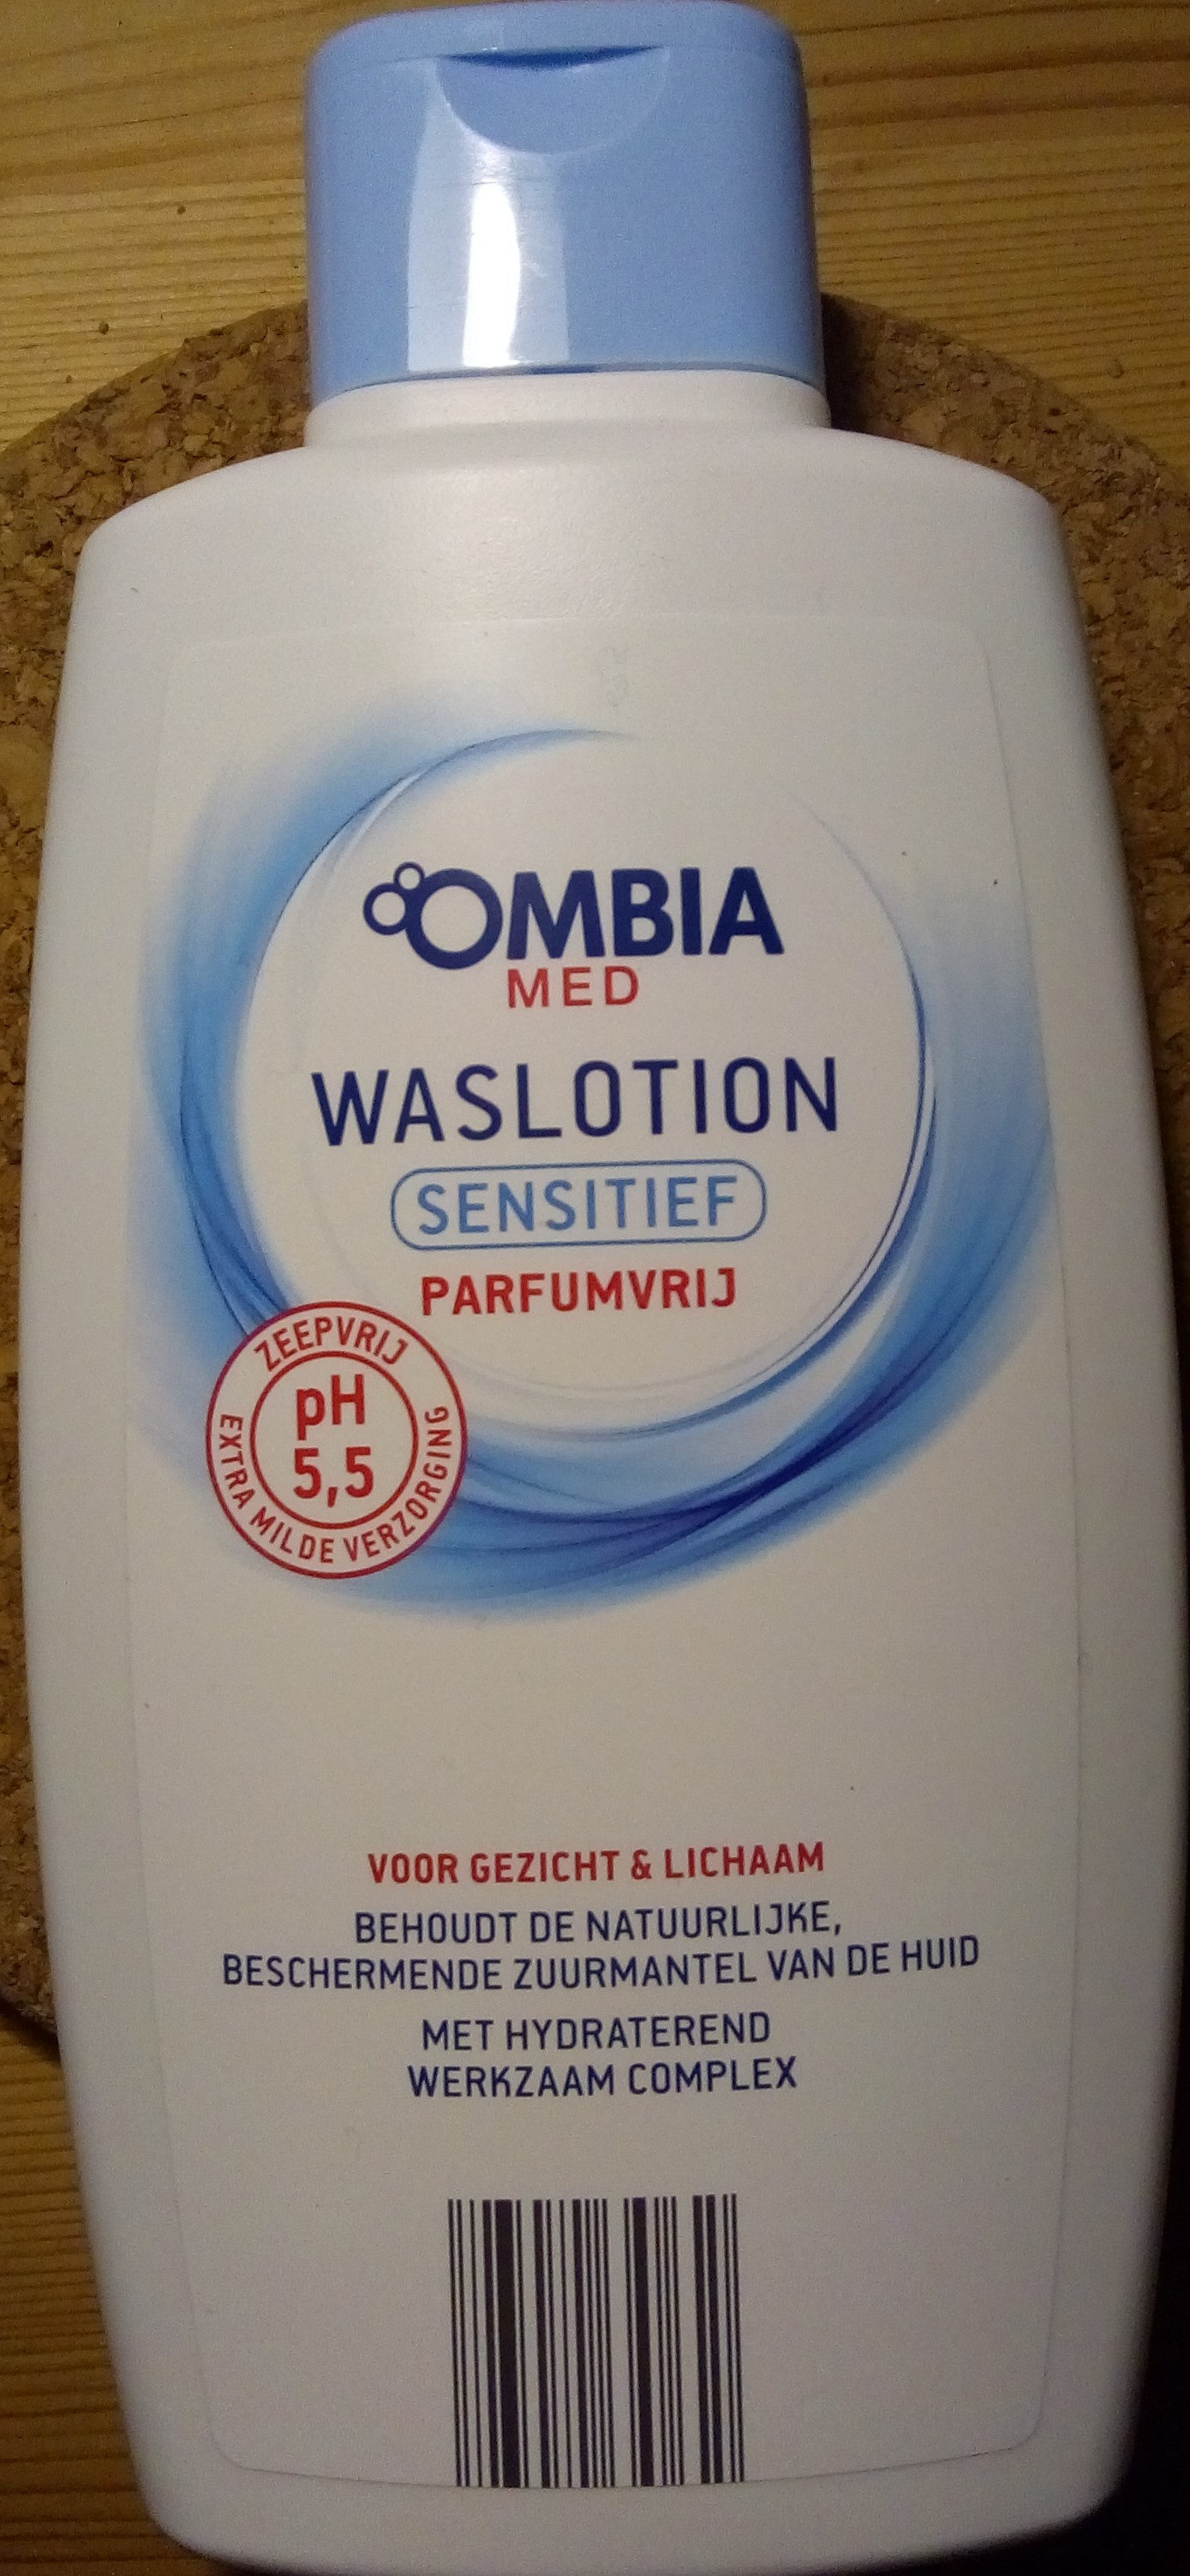 Ombia Med waslotion sensitief - Ingredients - nl